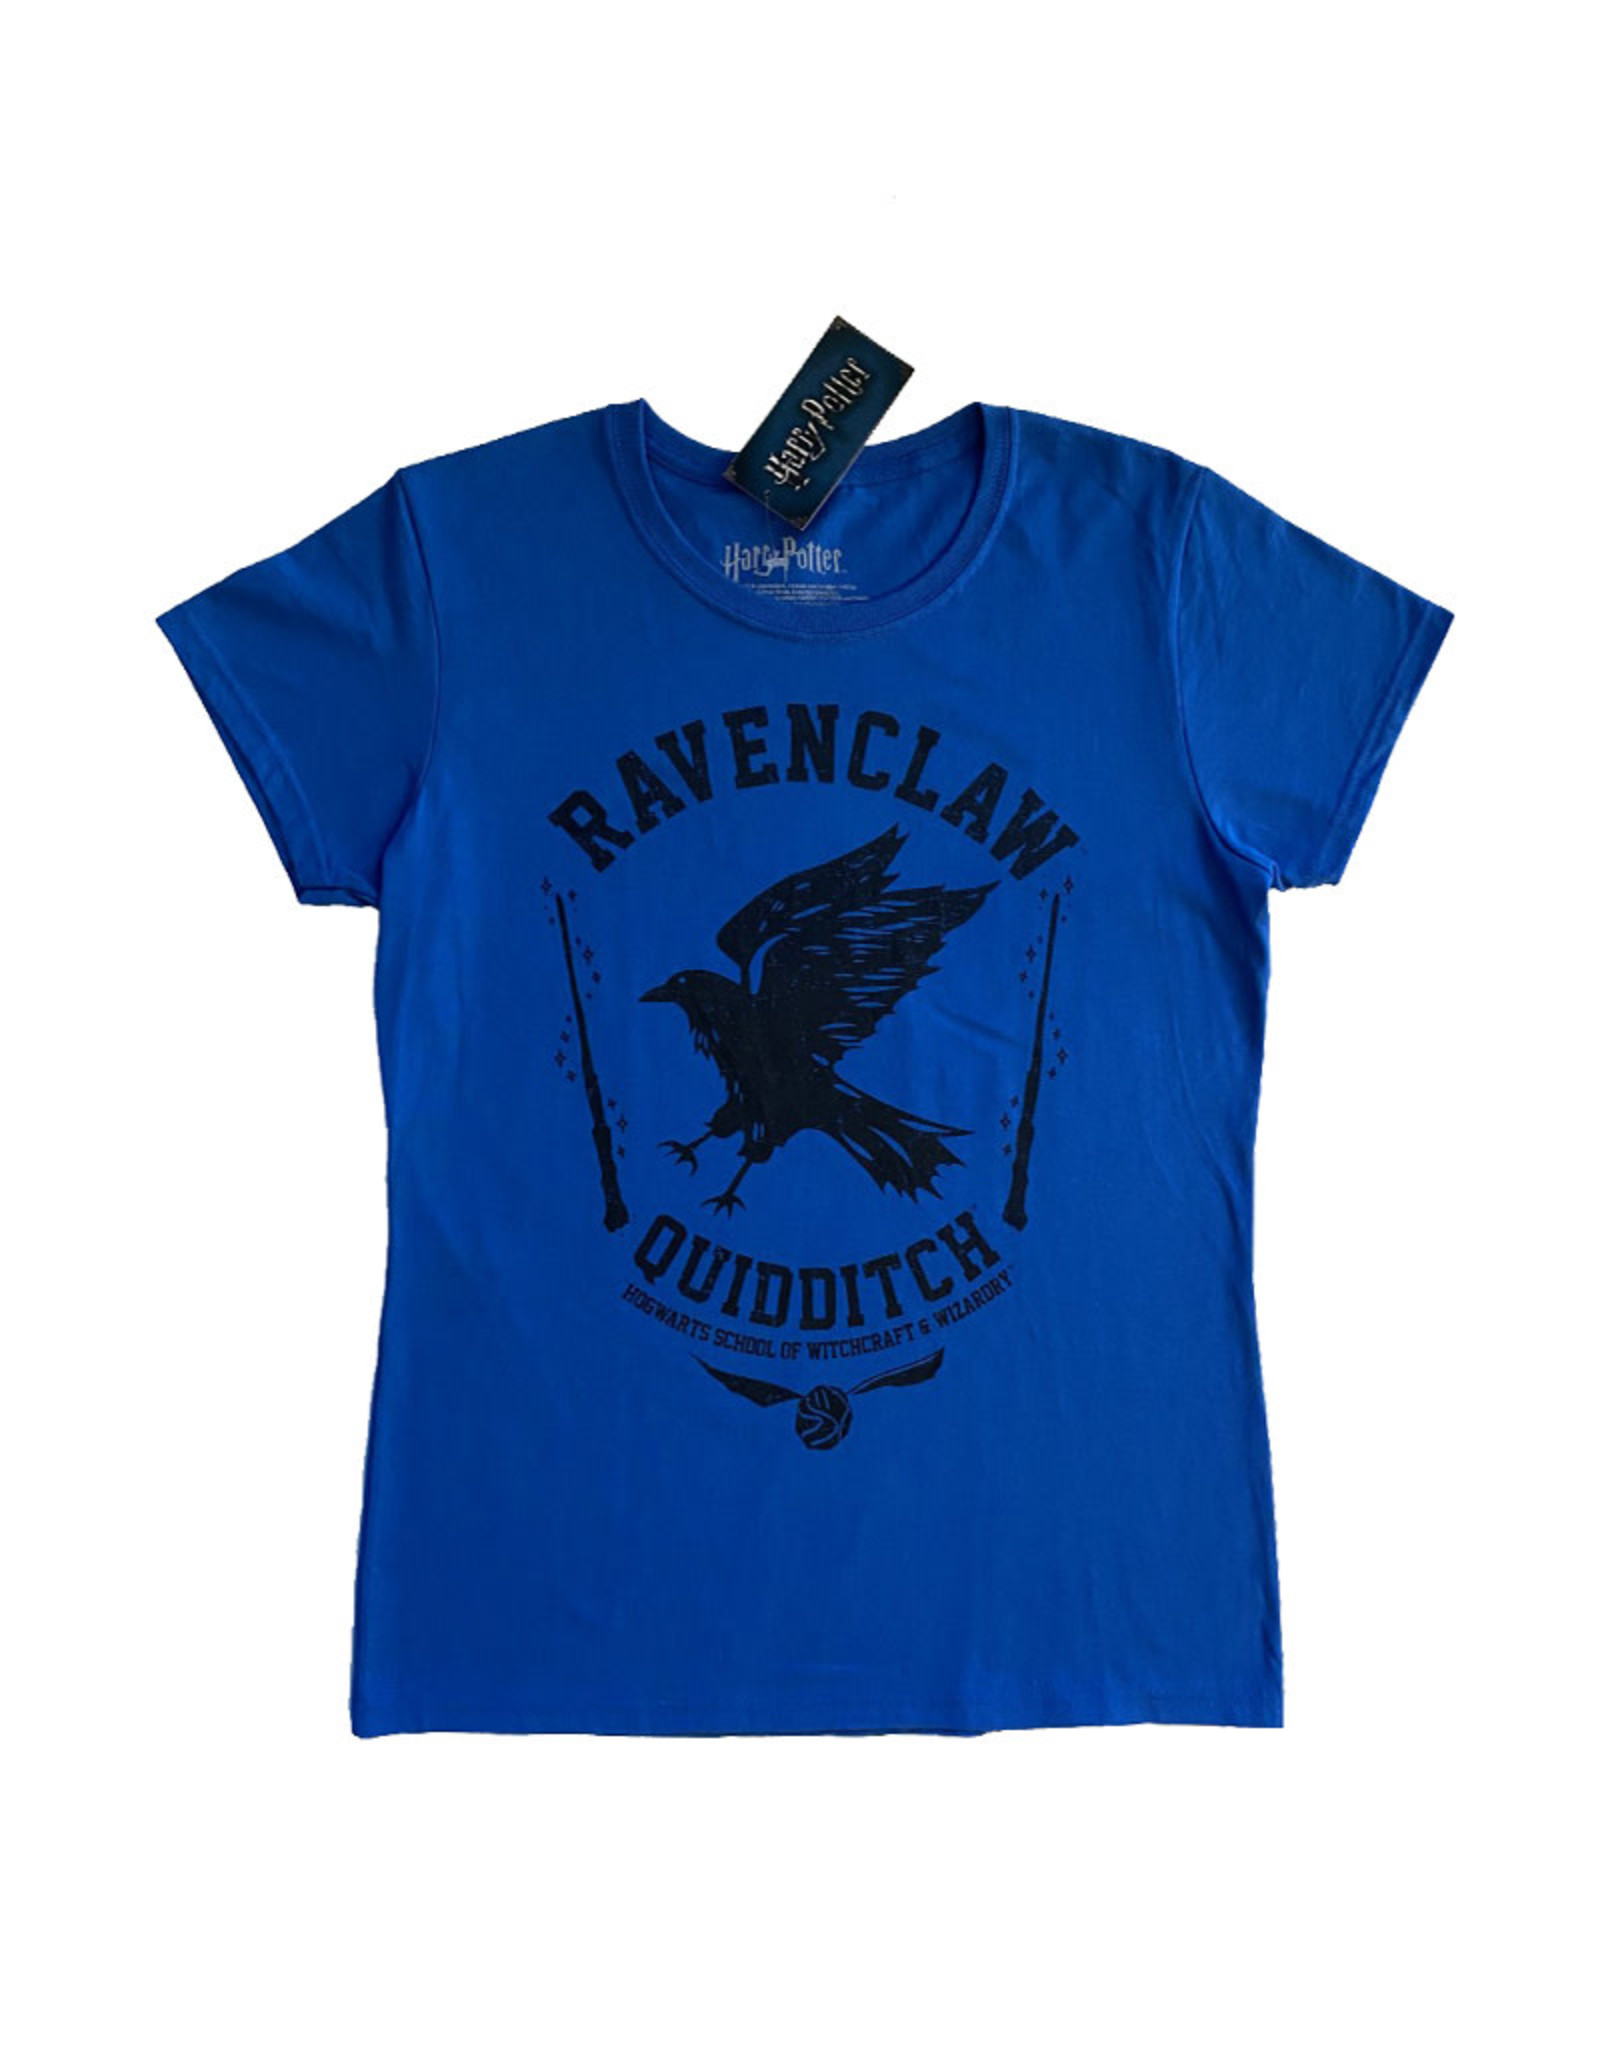 Harry Potter ( T-Shirt ) Ravenclaw Quidditch